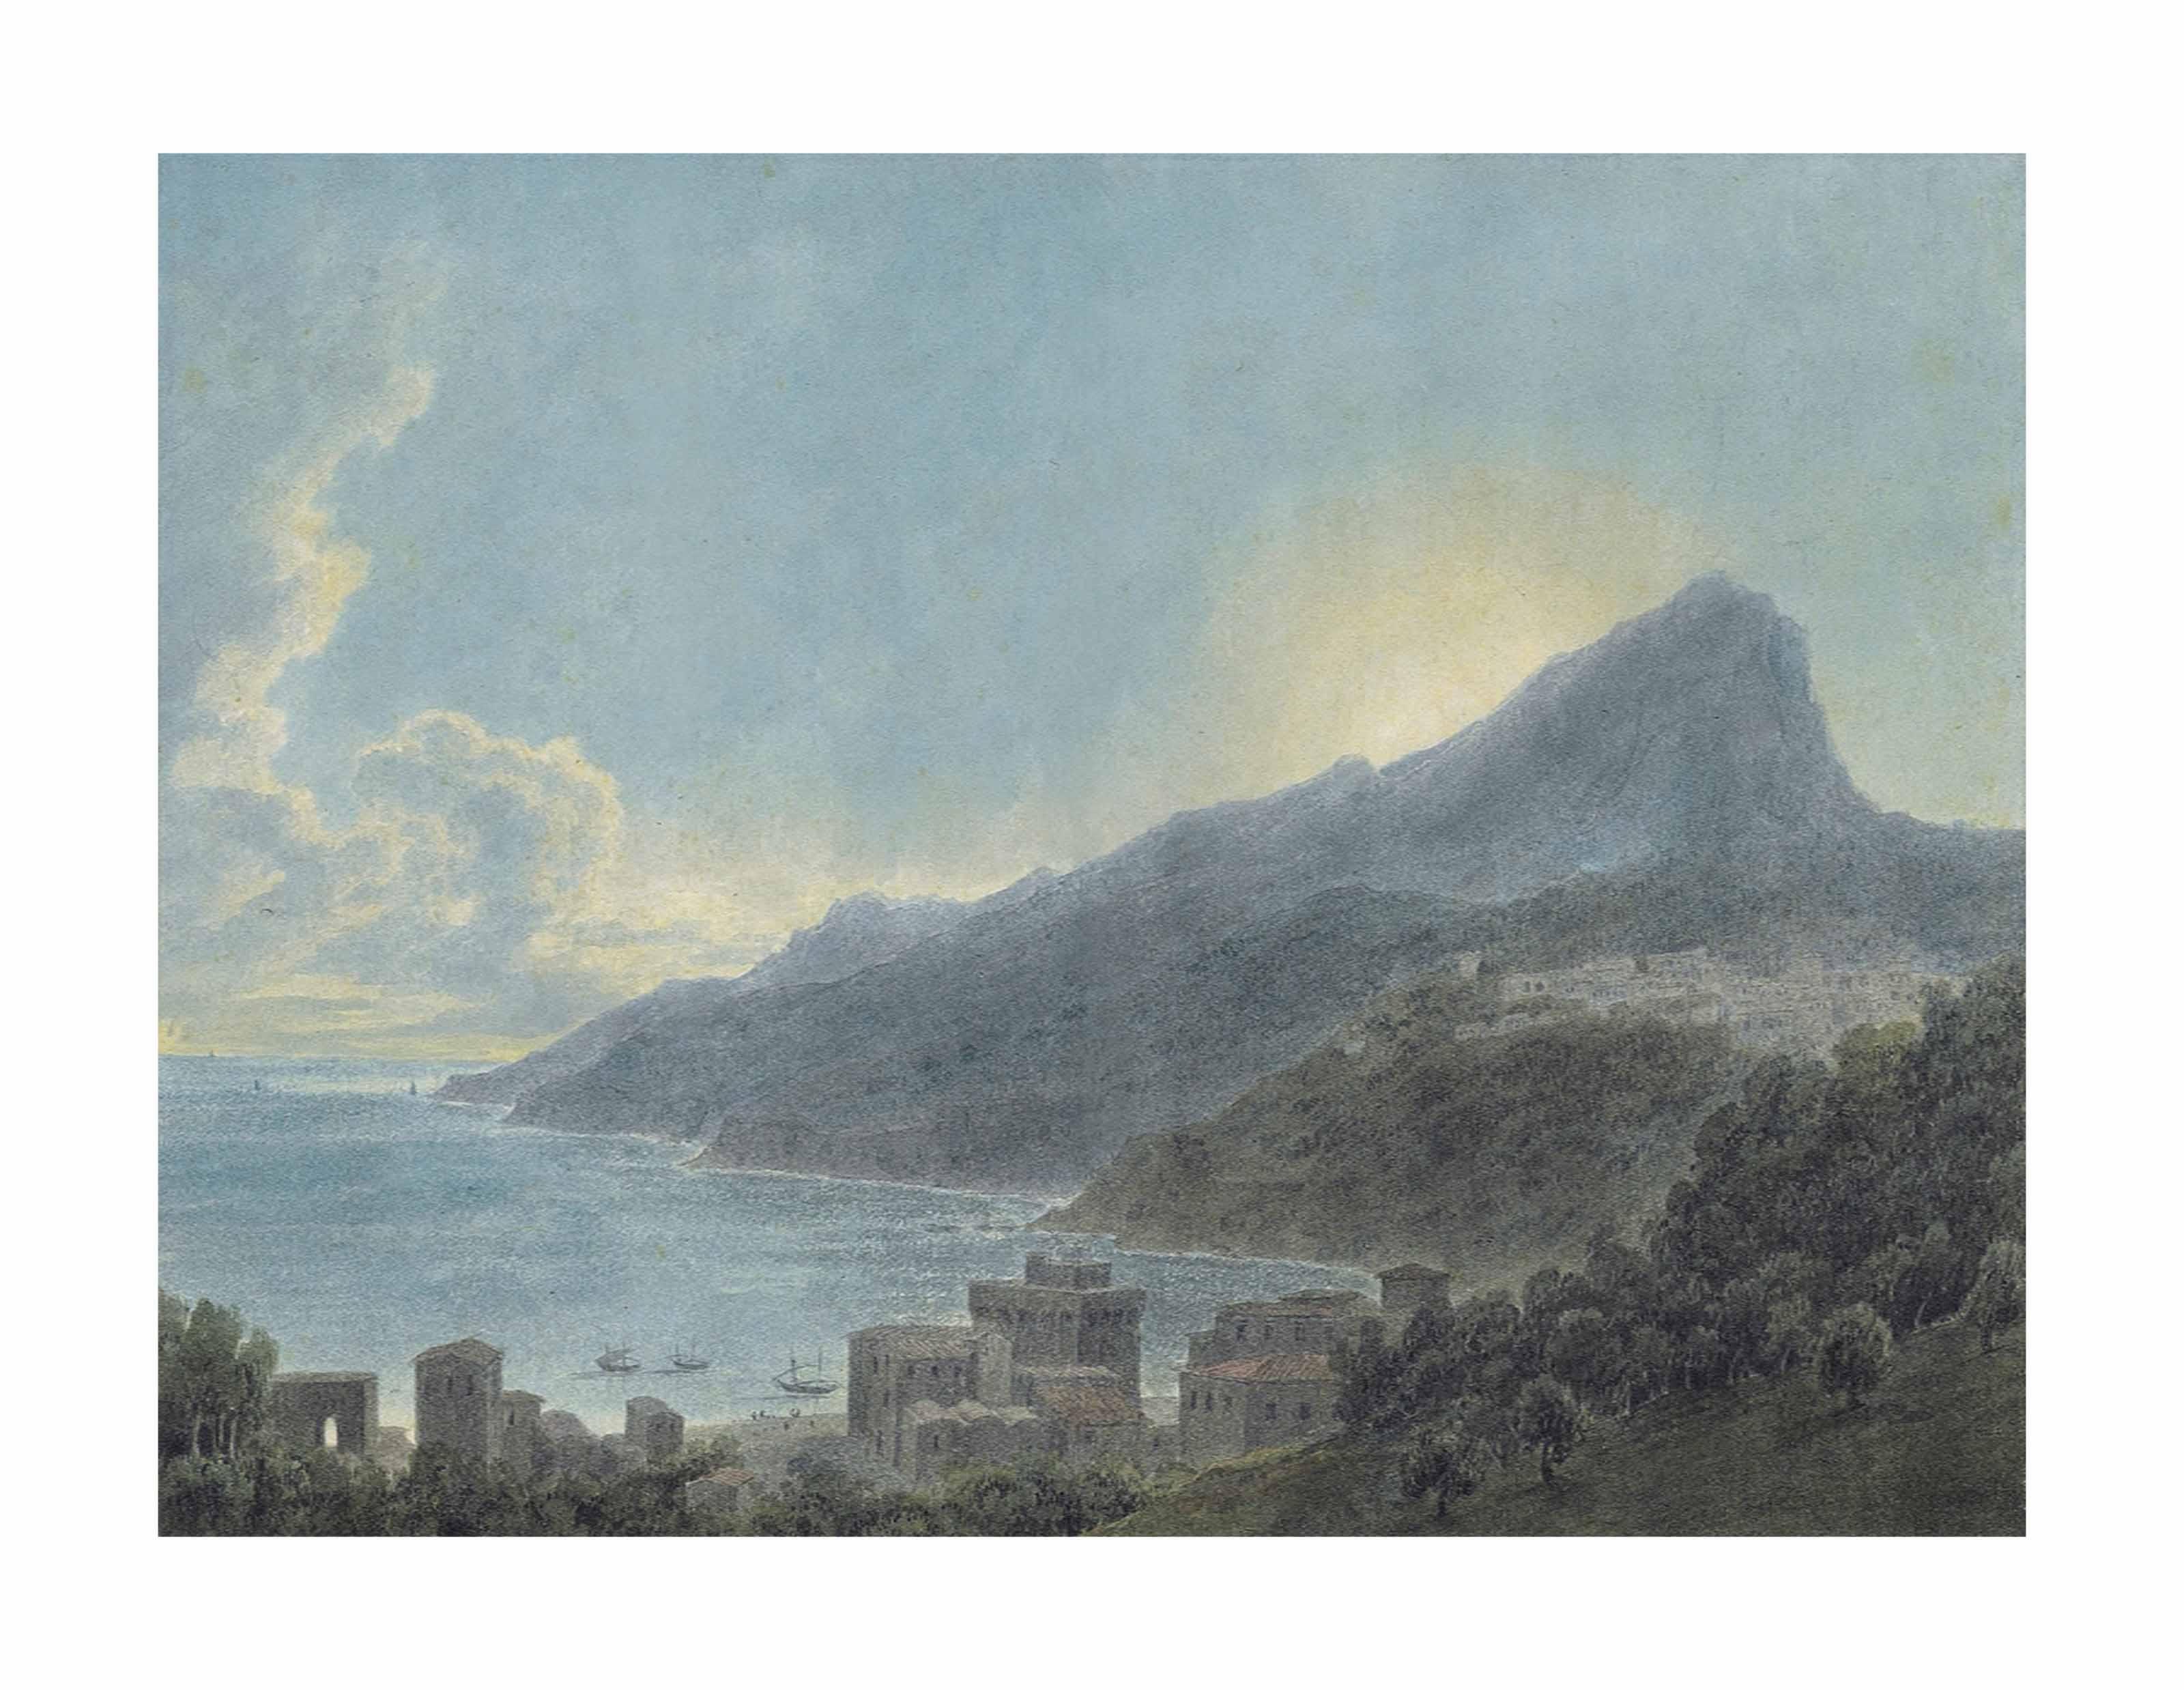 View of Vietri and Raito, Italy